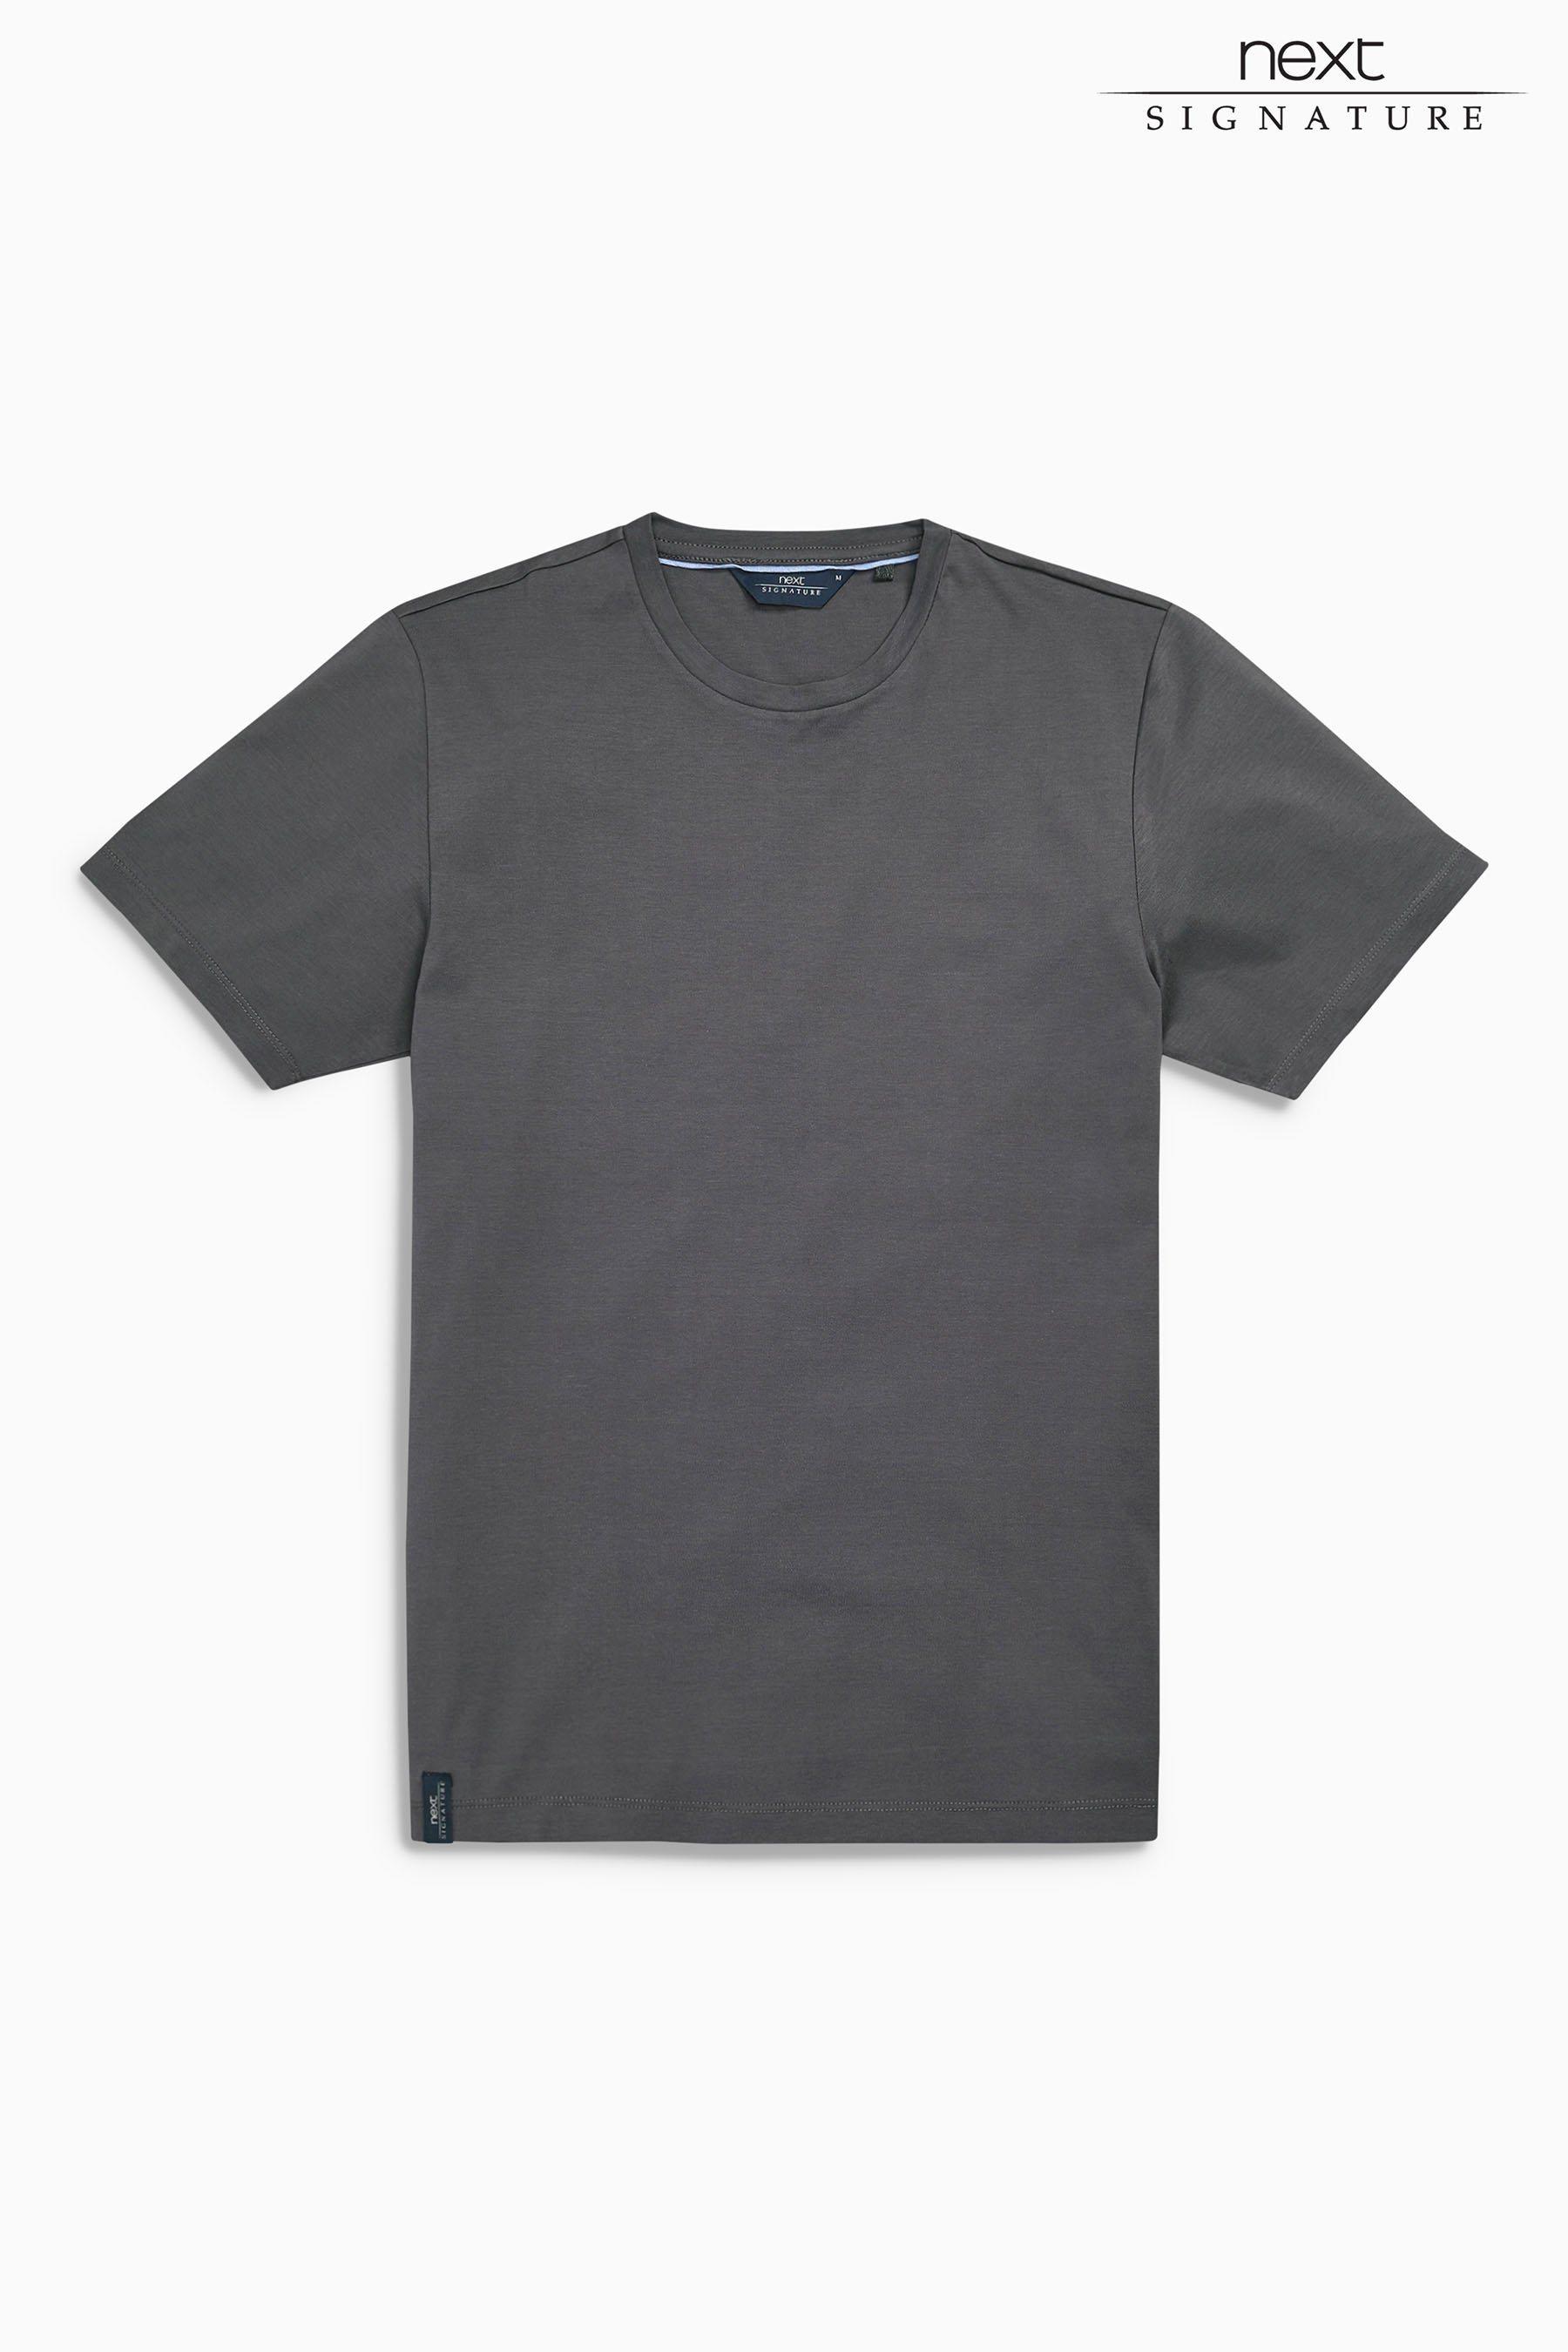 Next Merzerisiertes T-Shirt